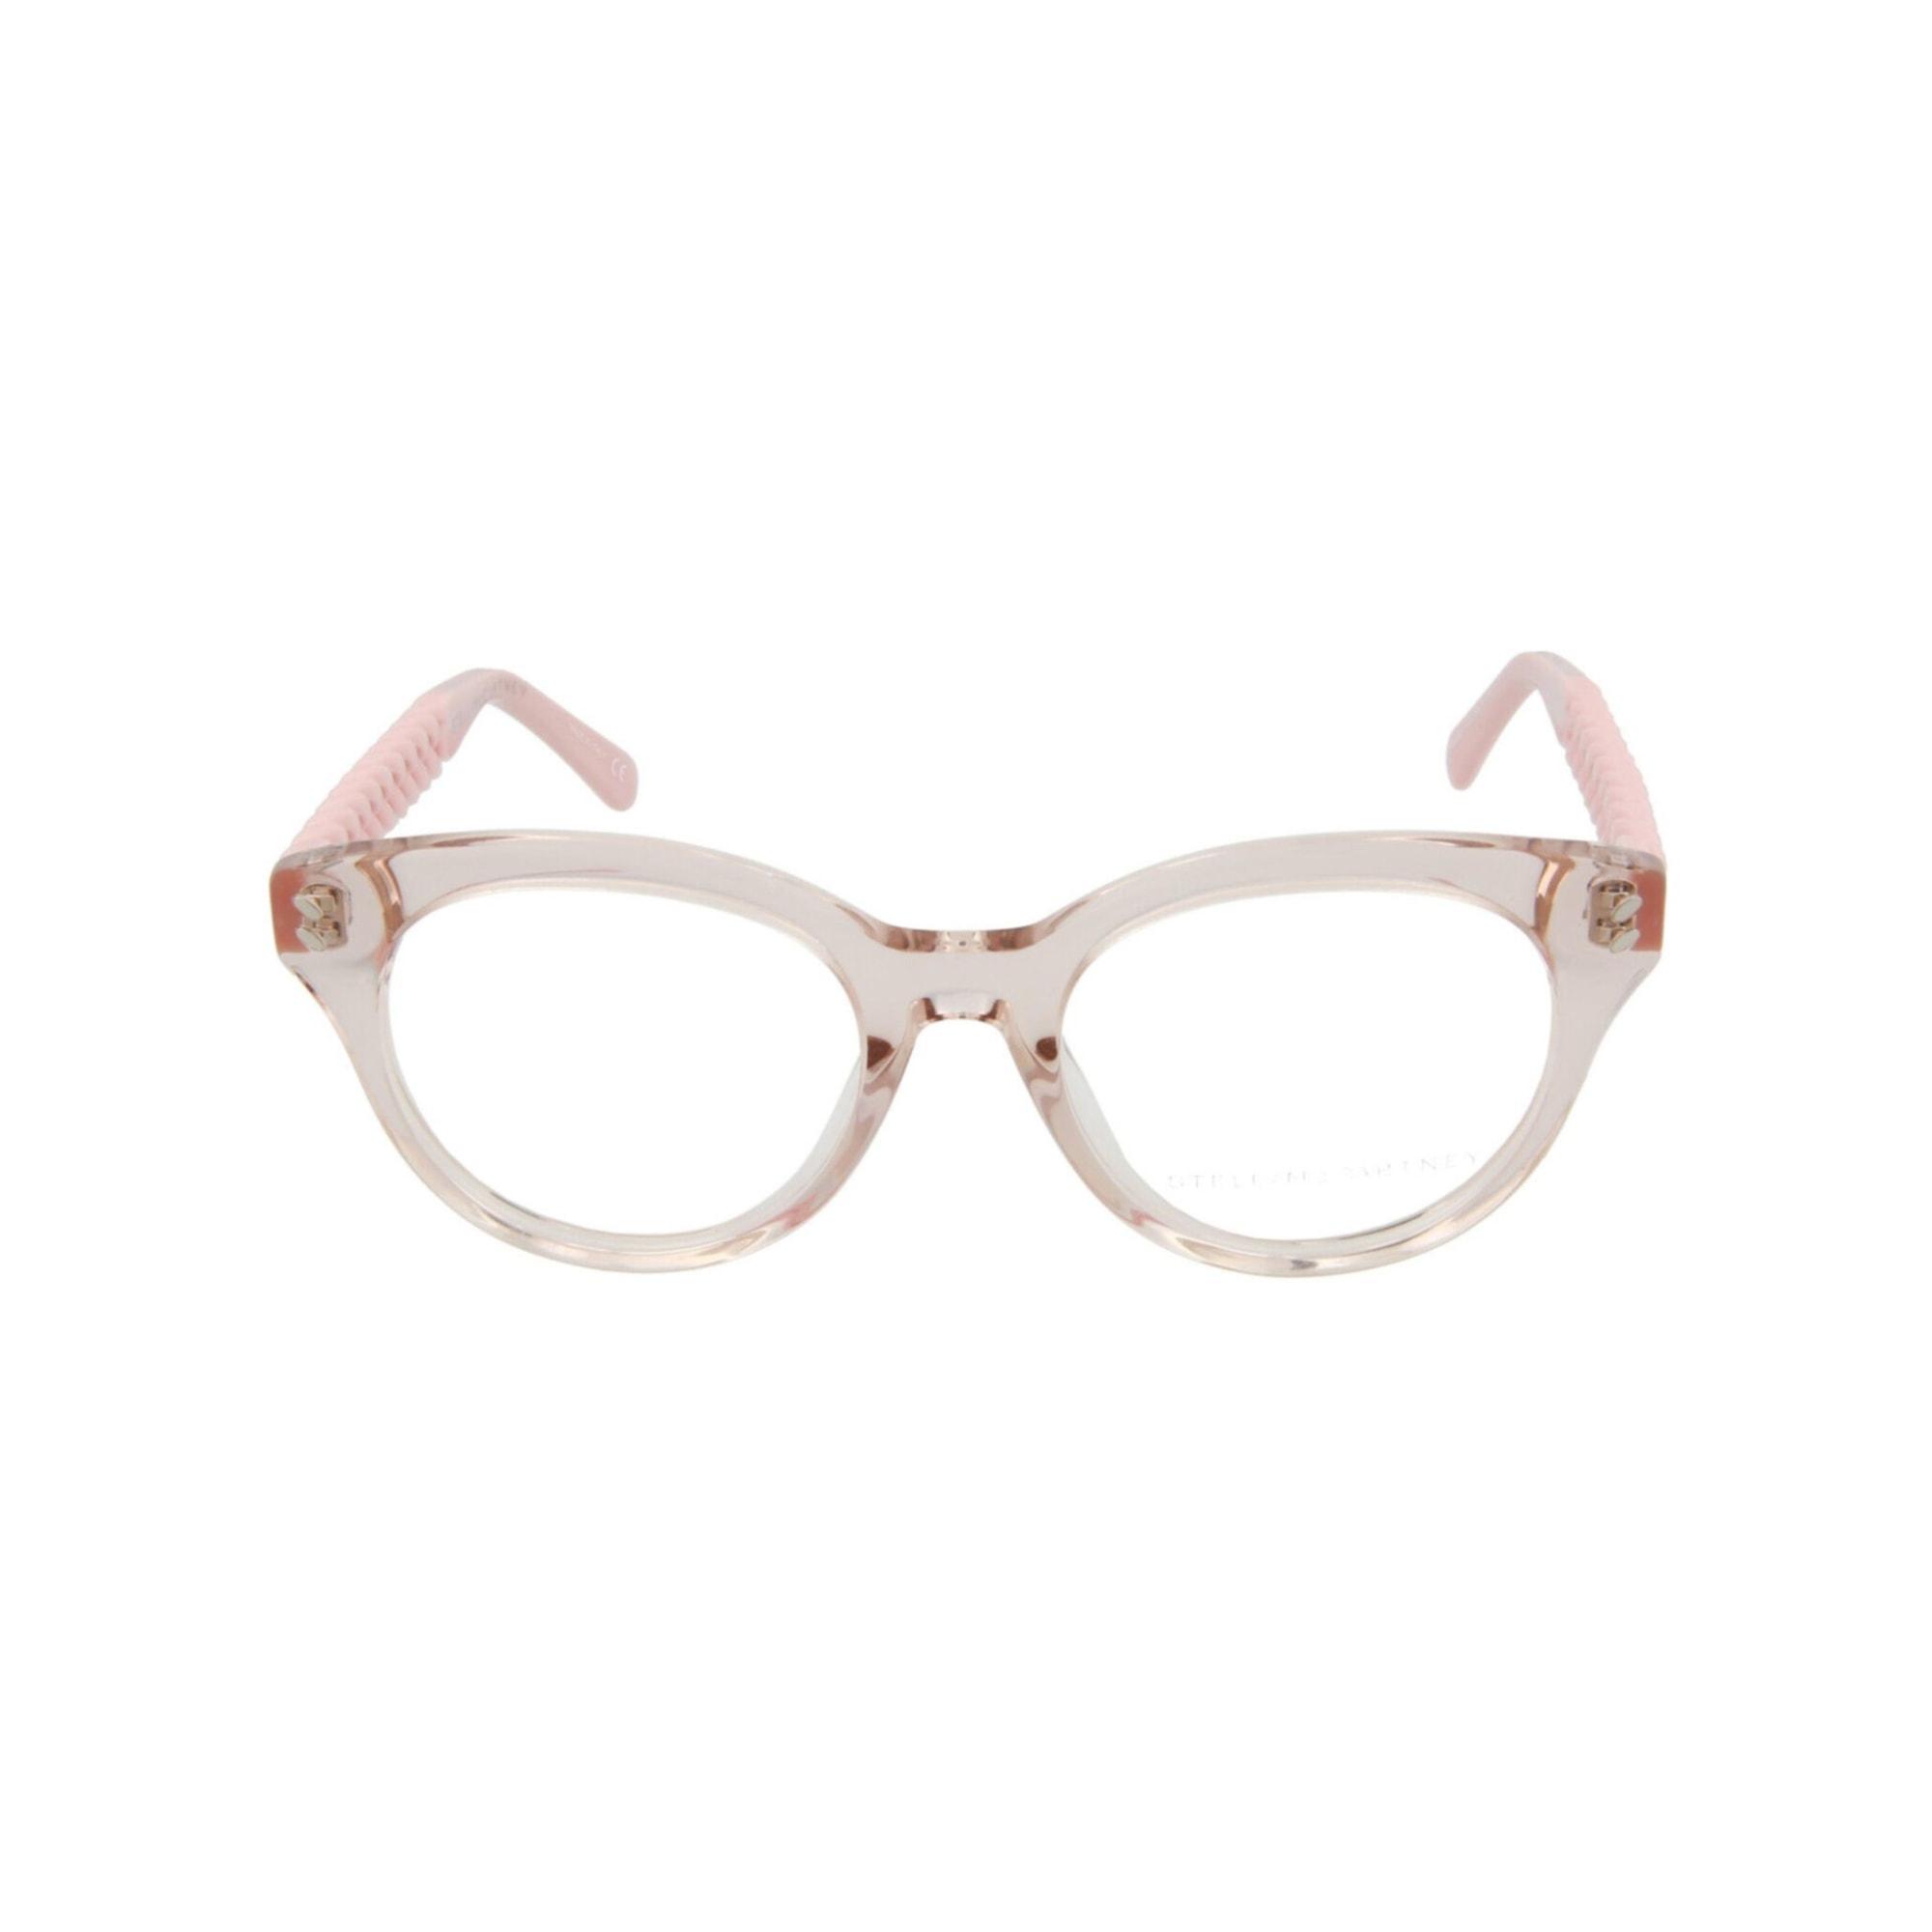 Sonnenbrille STELLA MCCARTNEY Pink,  altrosa